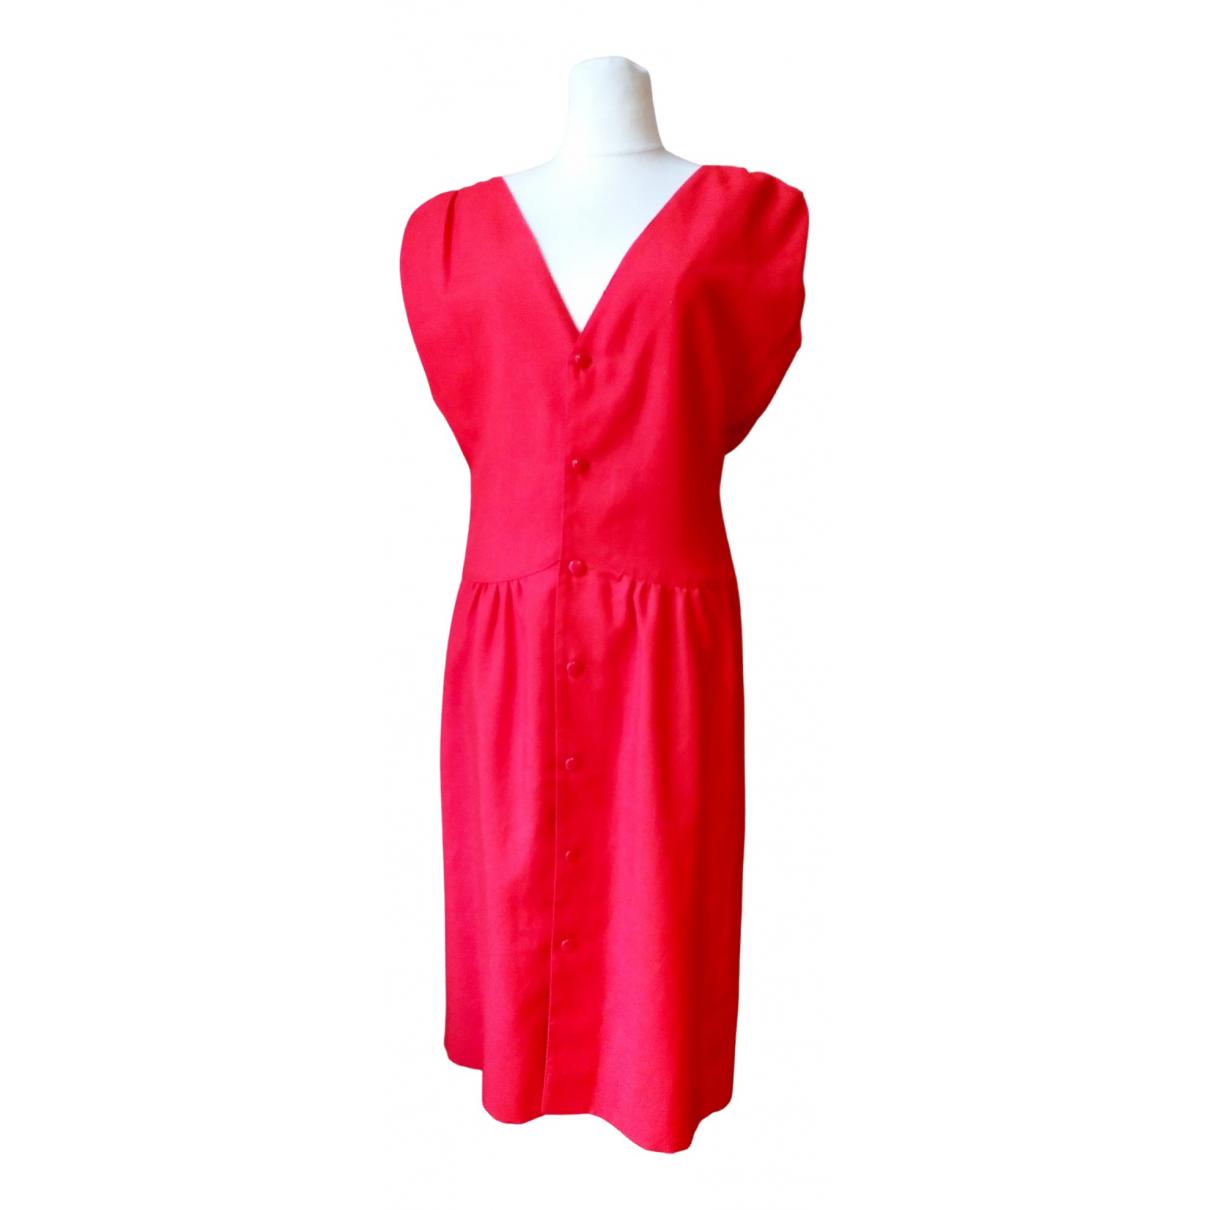 Courrèges \N Red dress for Women 36 FR